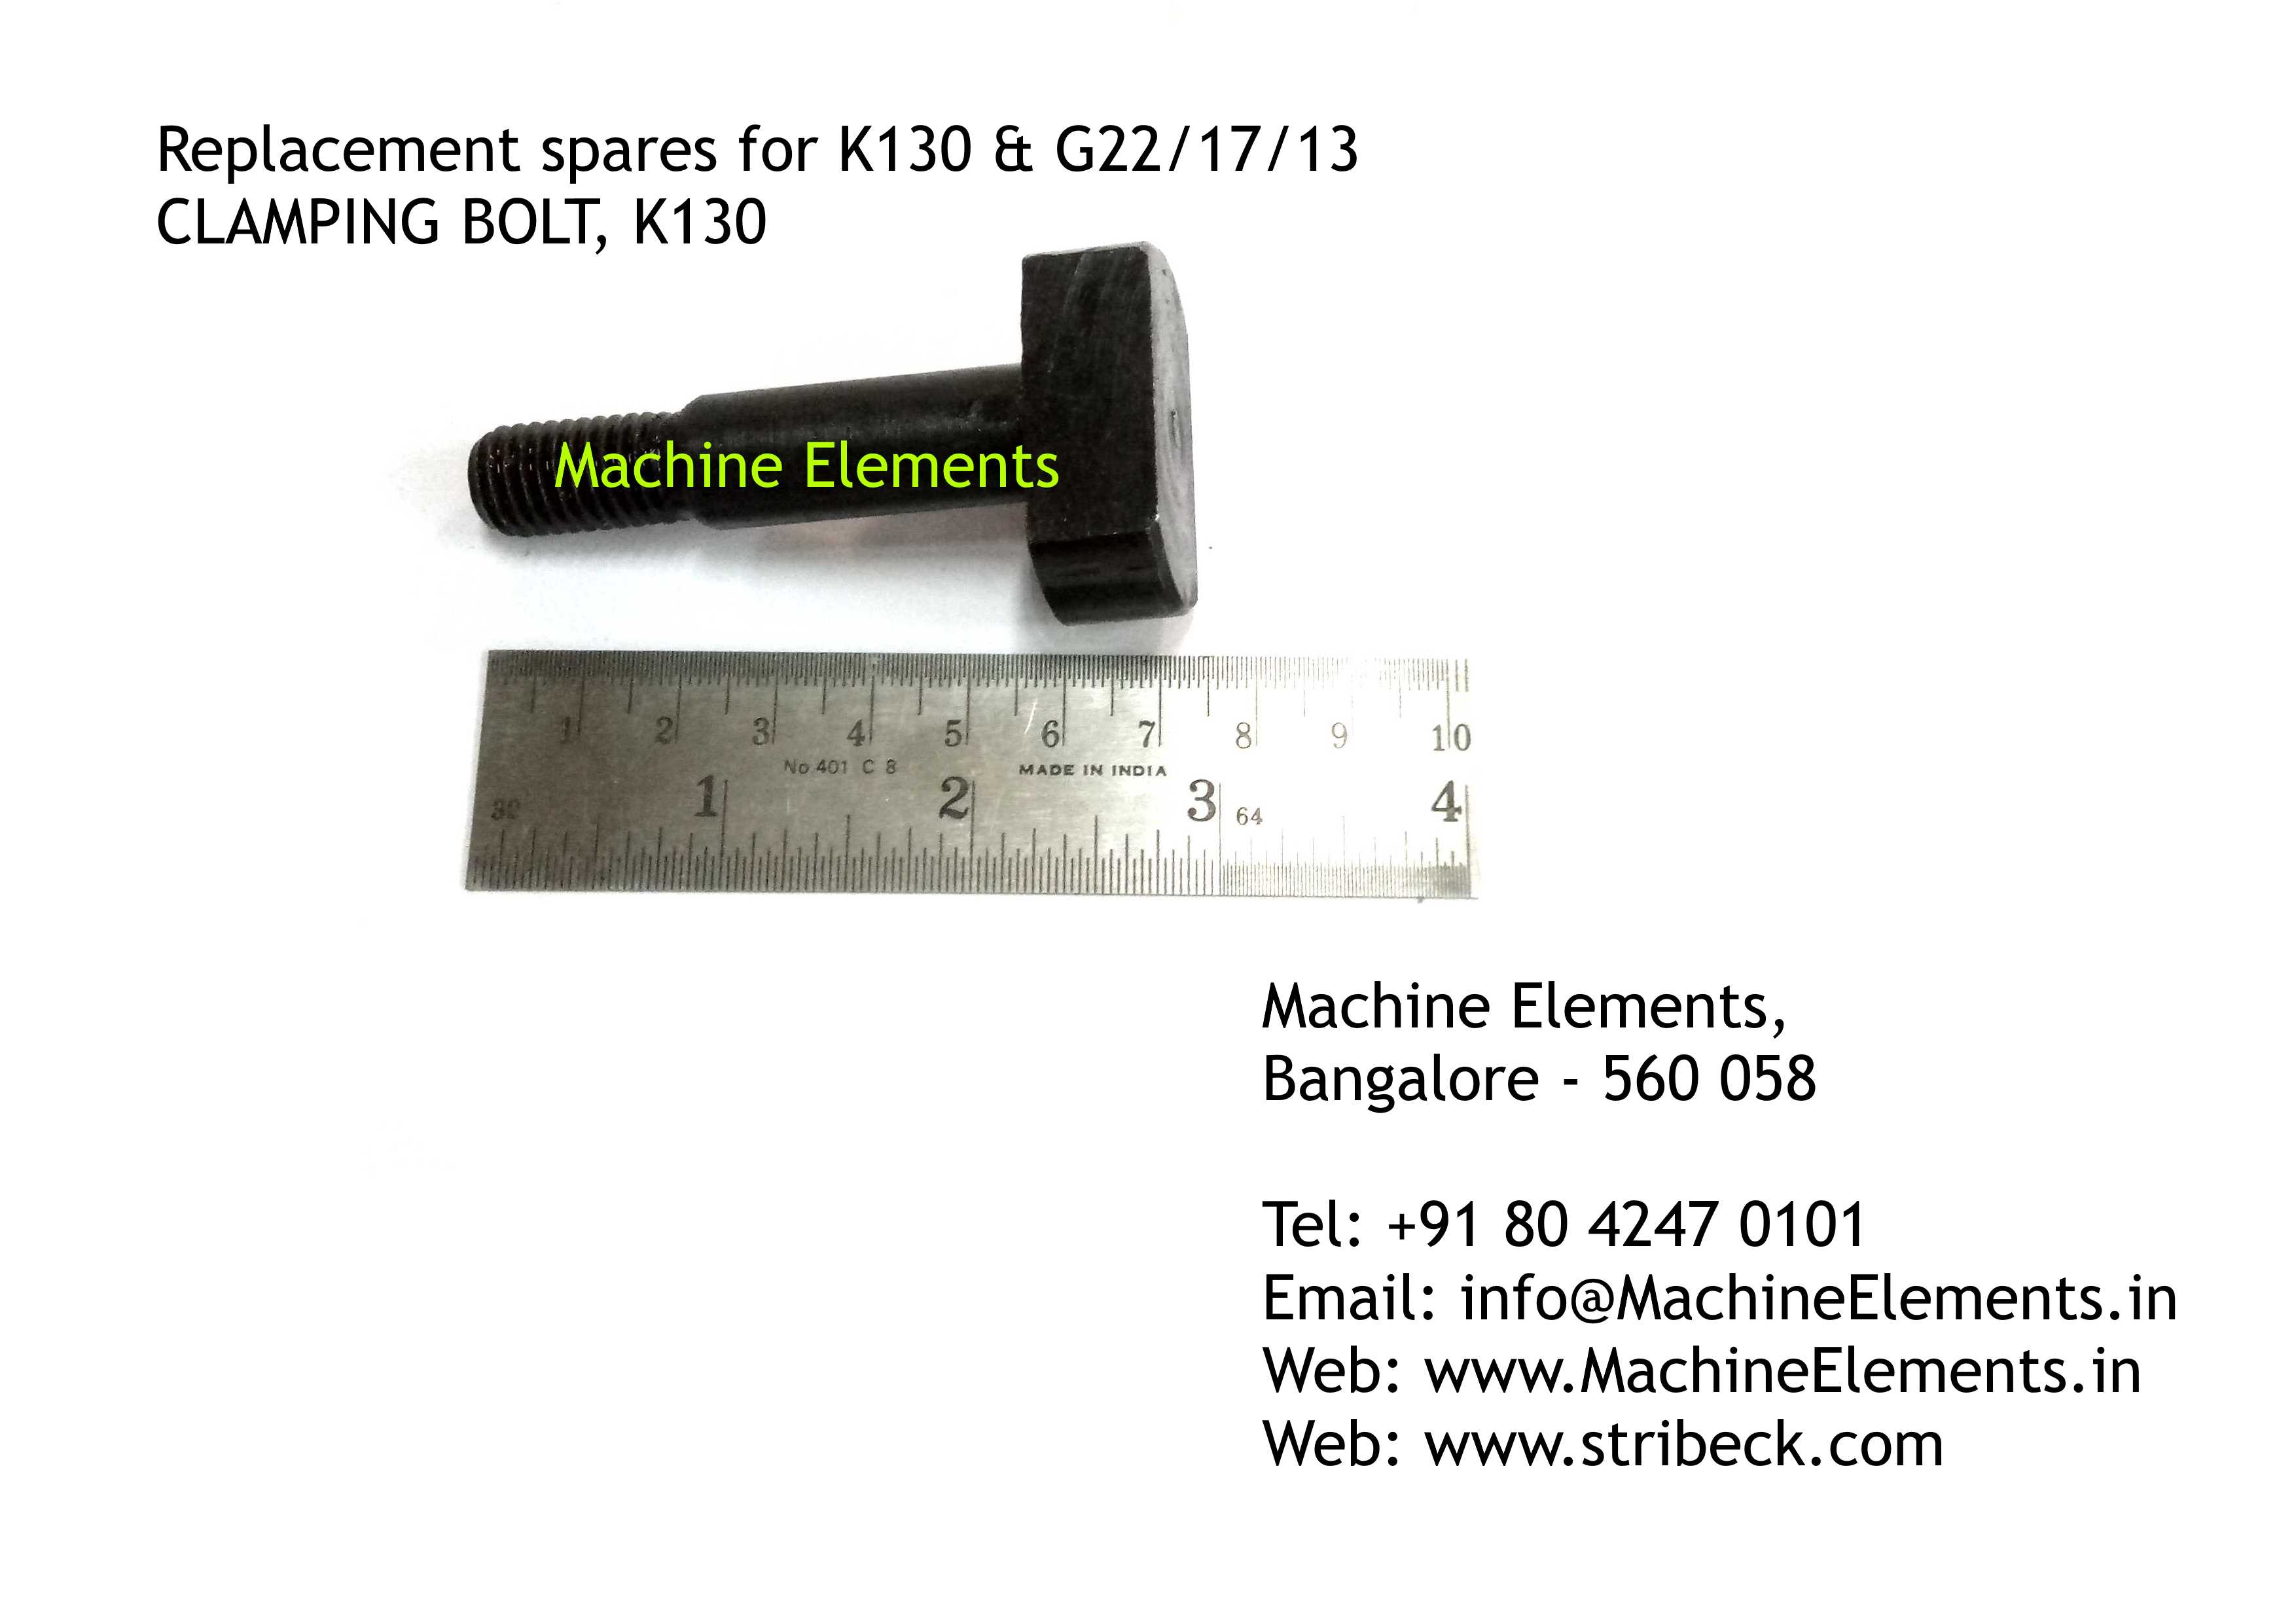 CLAMPING BOLT, K130